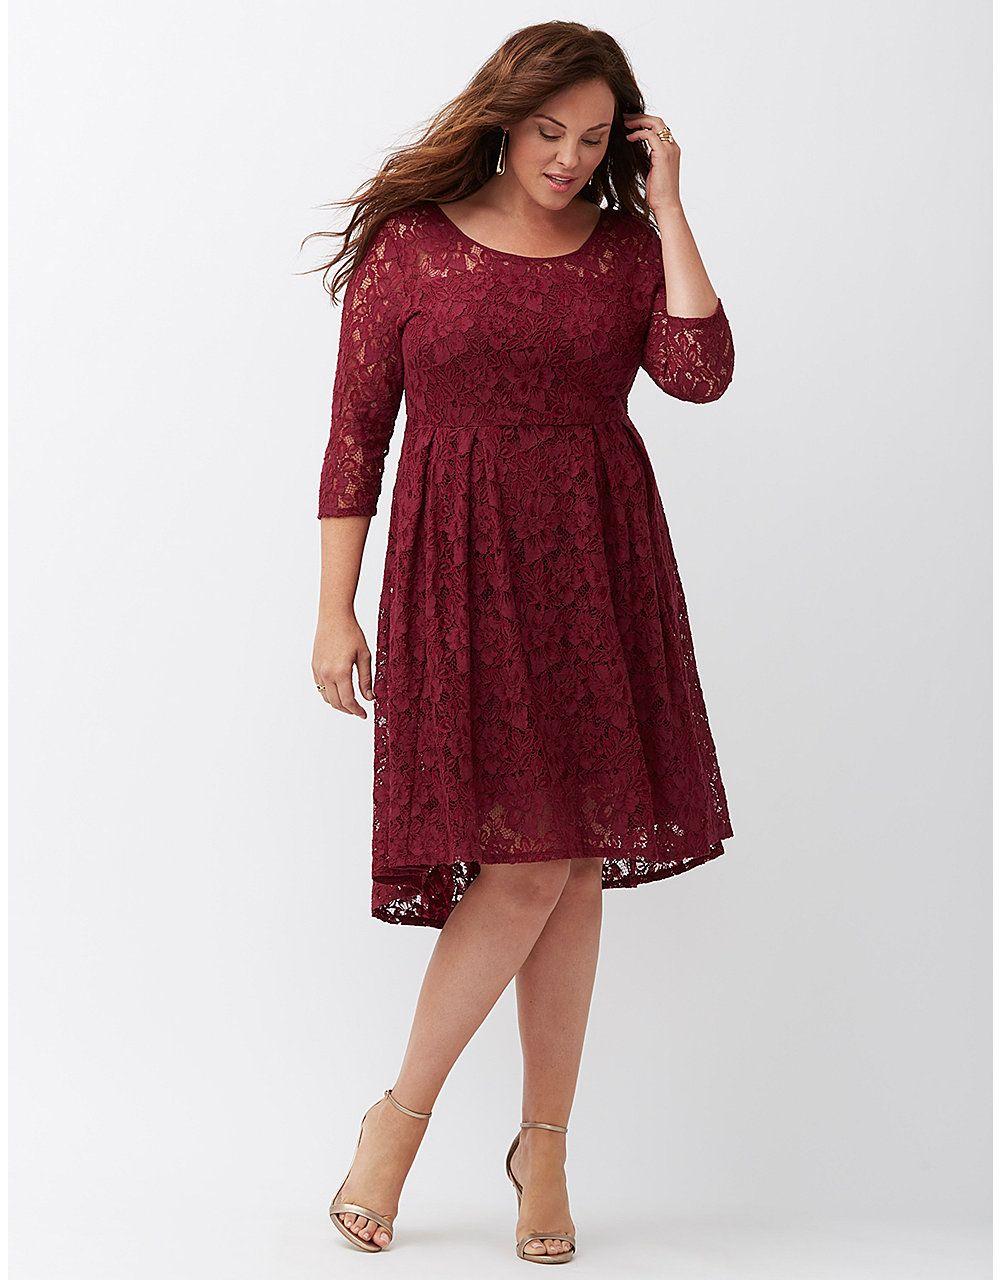 Lane Bryant Fit Flare Dress Lace Burgundy Dress Maroon Lace Dress